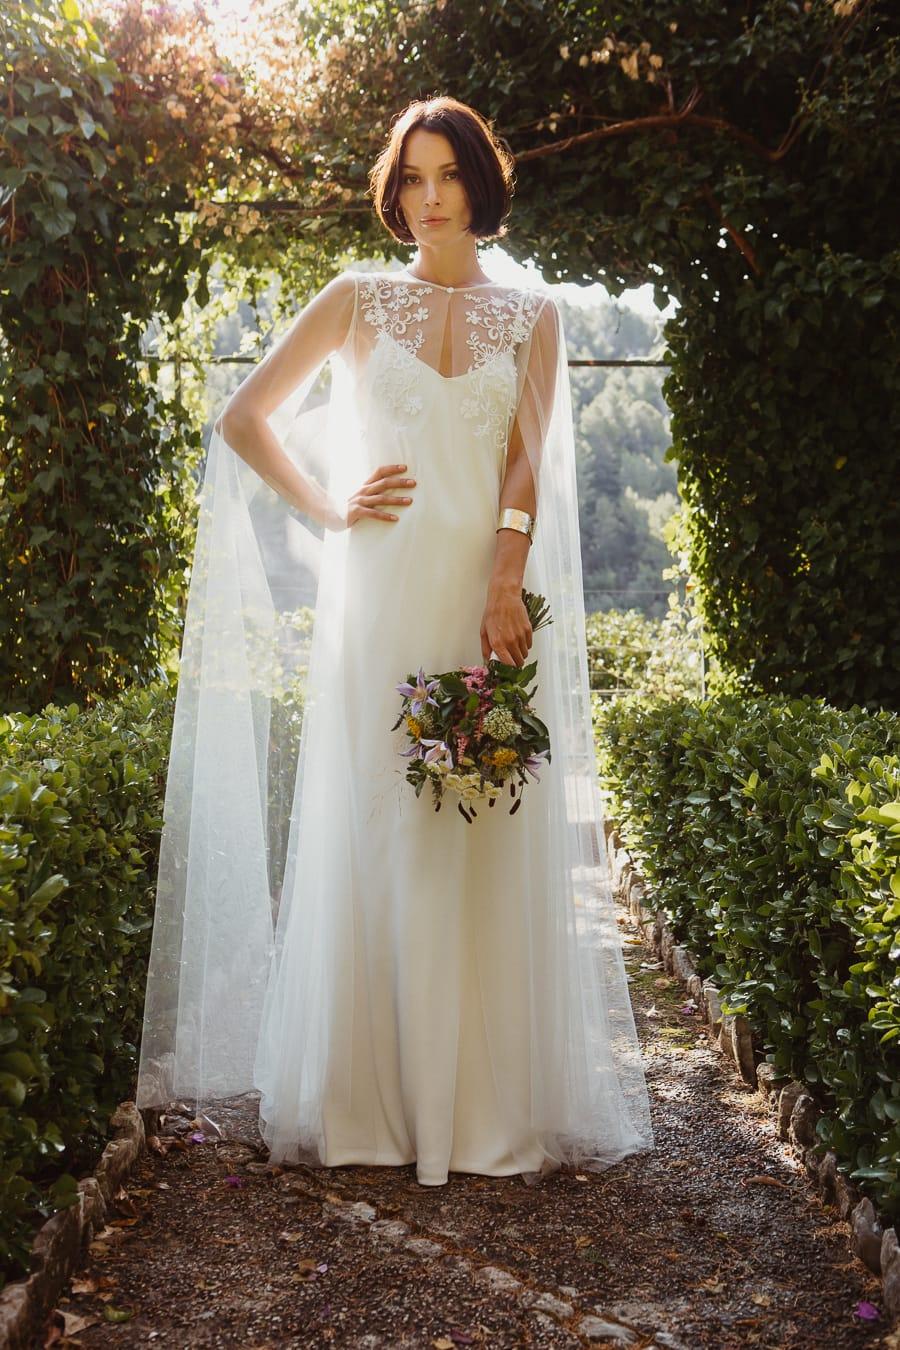 Vestido de novia vintage capa